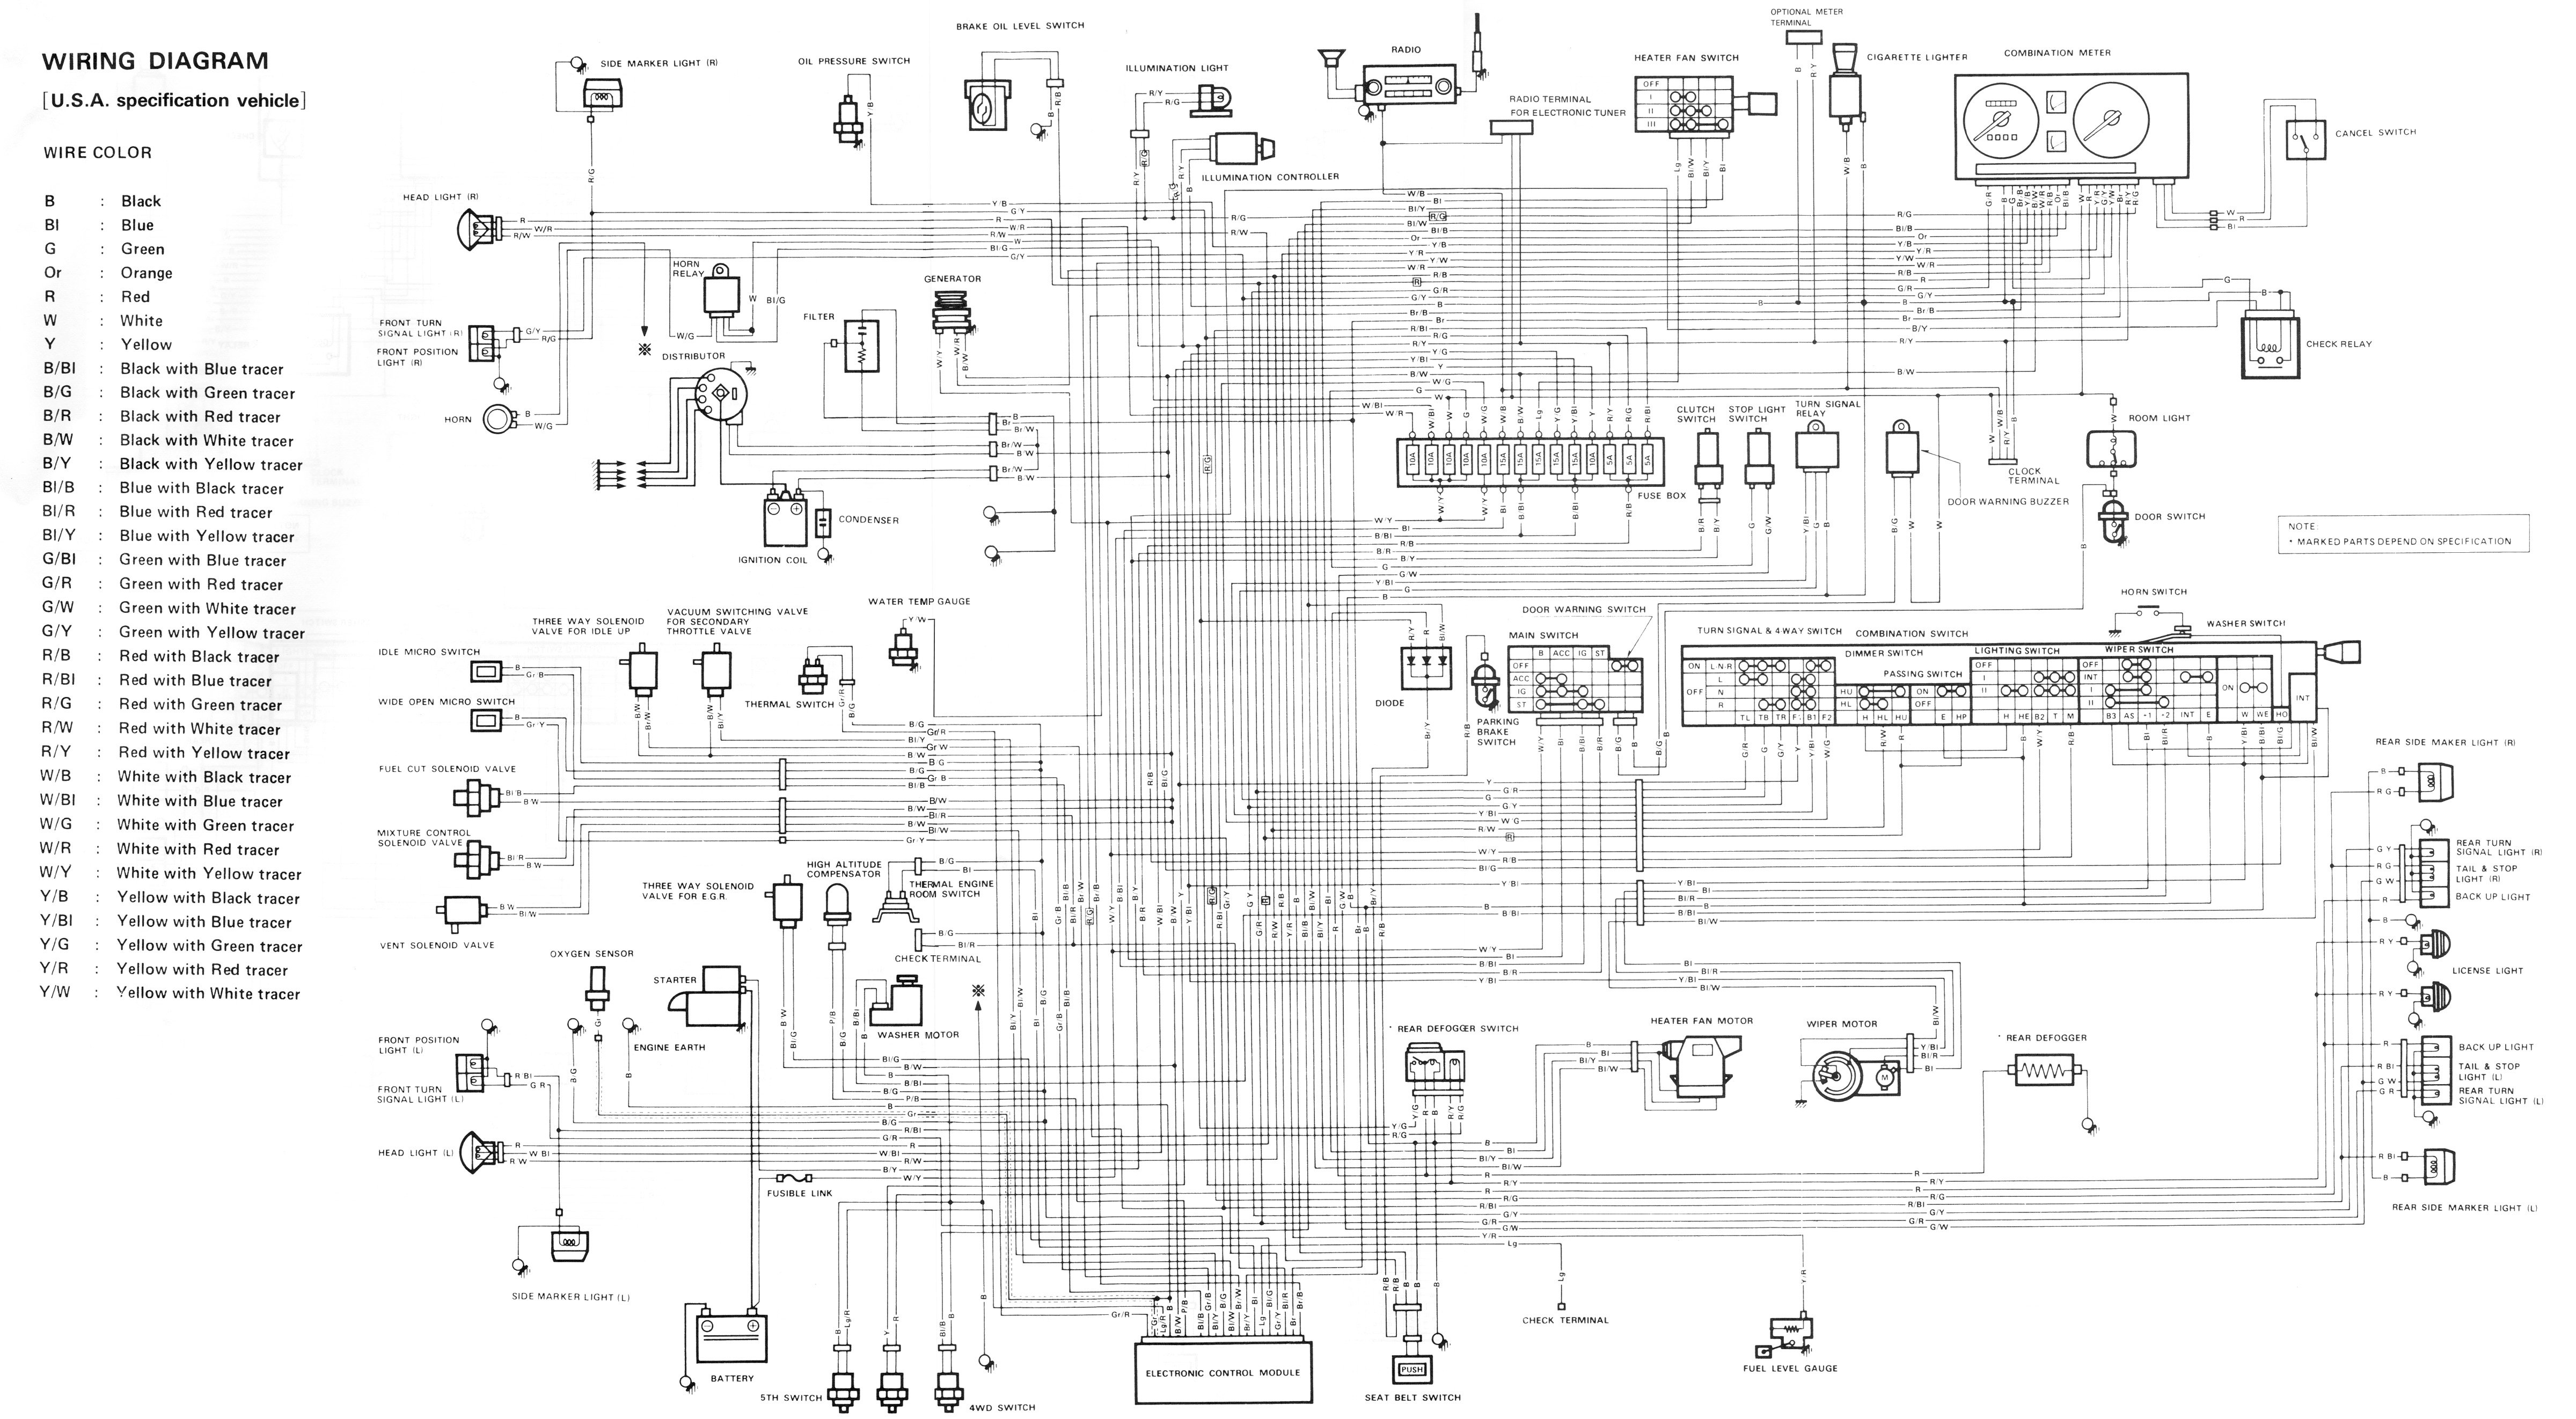 Caterpillar Alternator Wiring Diagram likewise Fuse Box Location Suzuki Esteem further Chevy Hei Distributor Wiring Diagram In Kwikpik furthermore P 0996b43f80379665 besides Honda Civic Fuse Box Diagrams 374430. on geo metro alternator wiring diagram